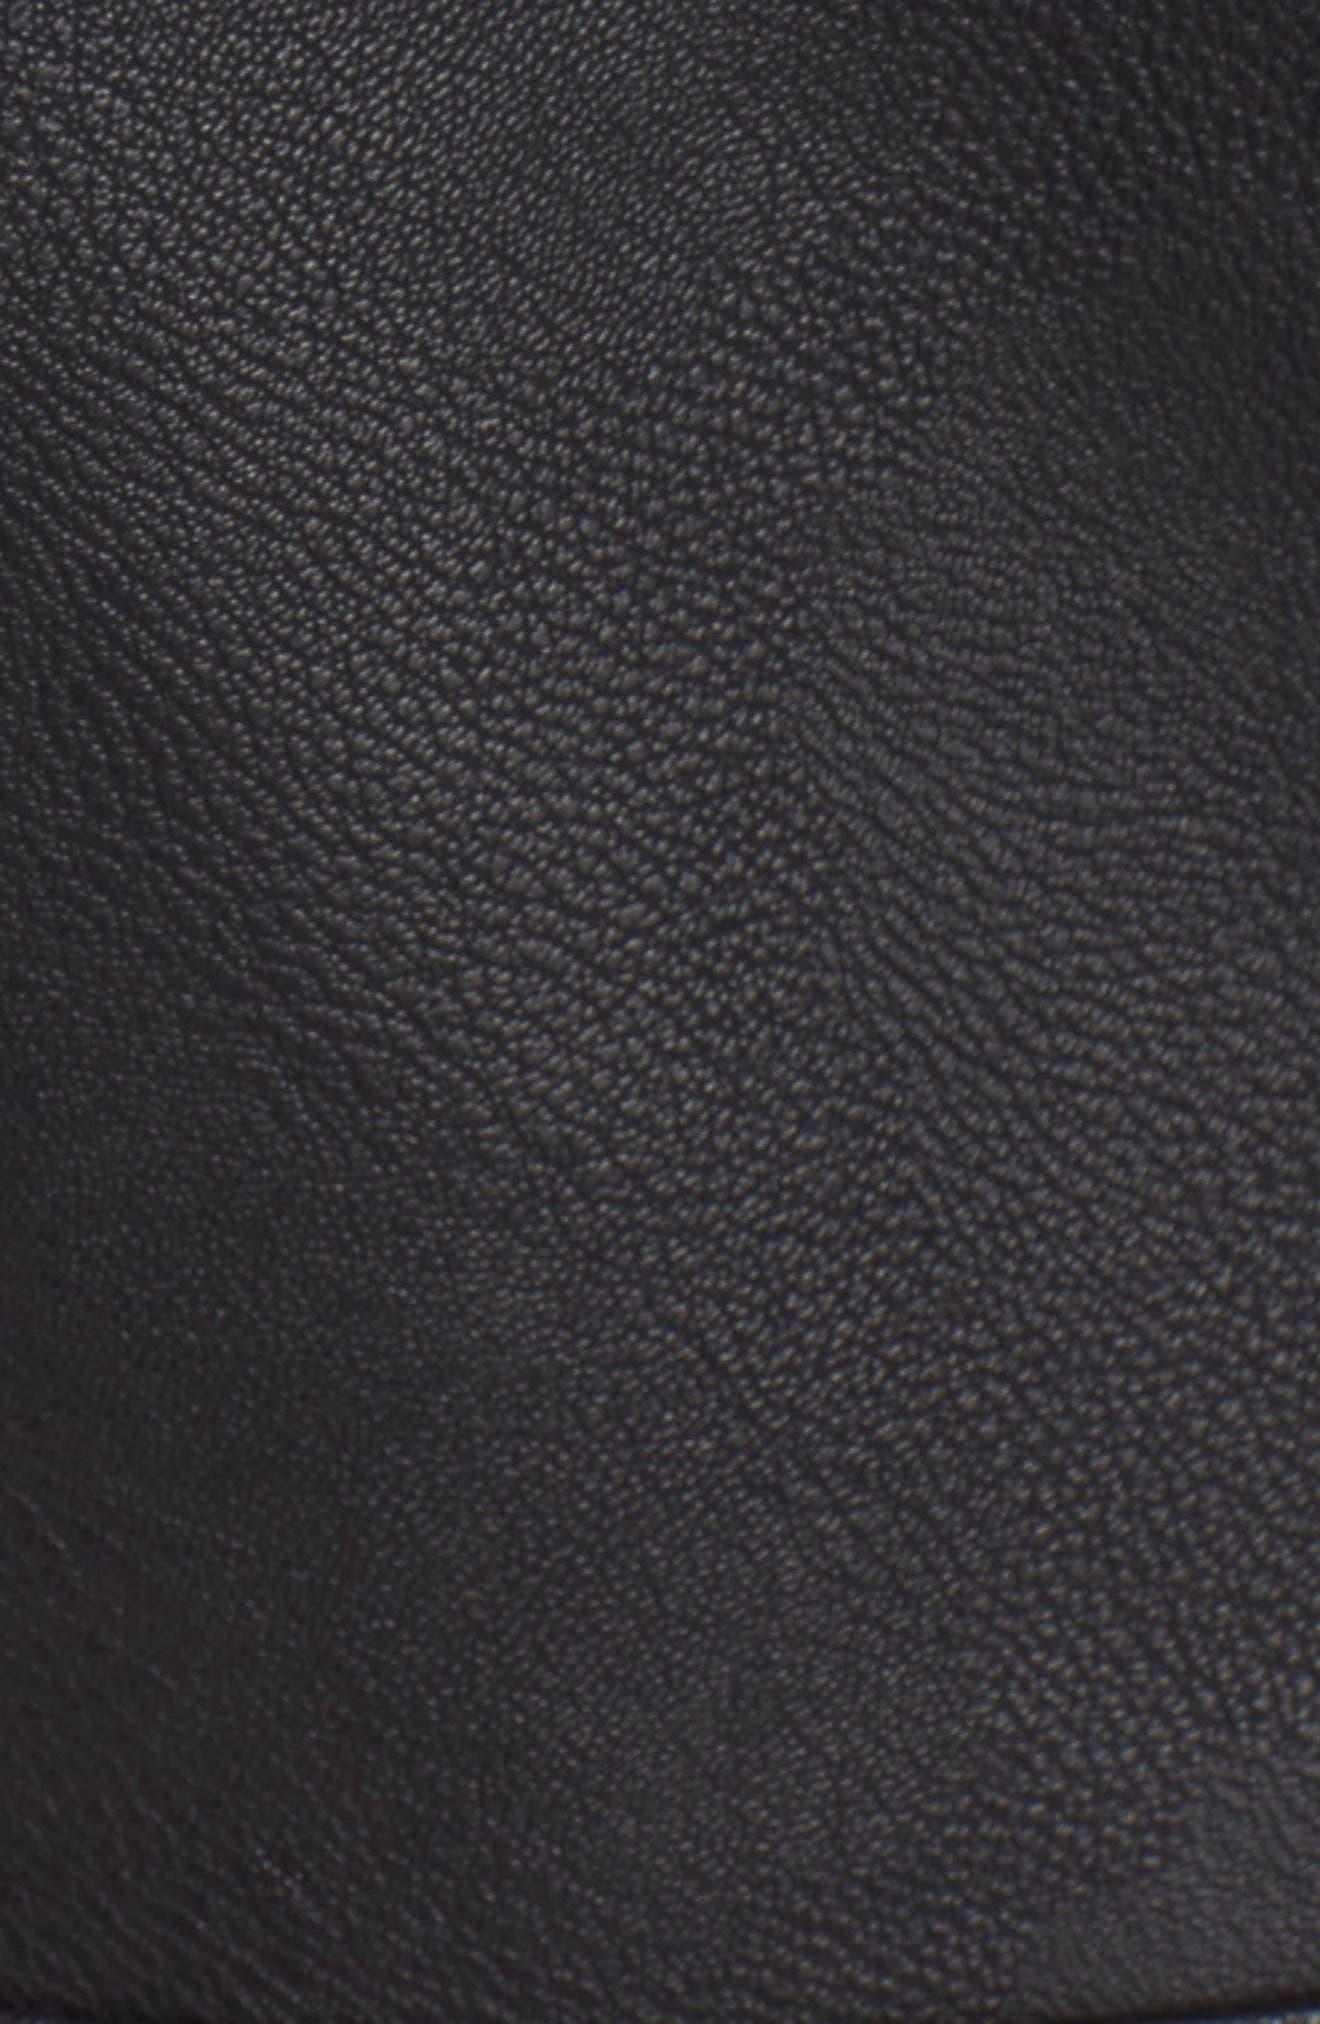 Faux Leather Hooded Biker Vest,                             Alternate thumbnail 6, color,                             010